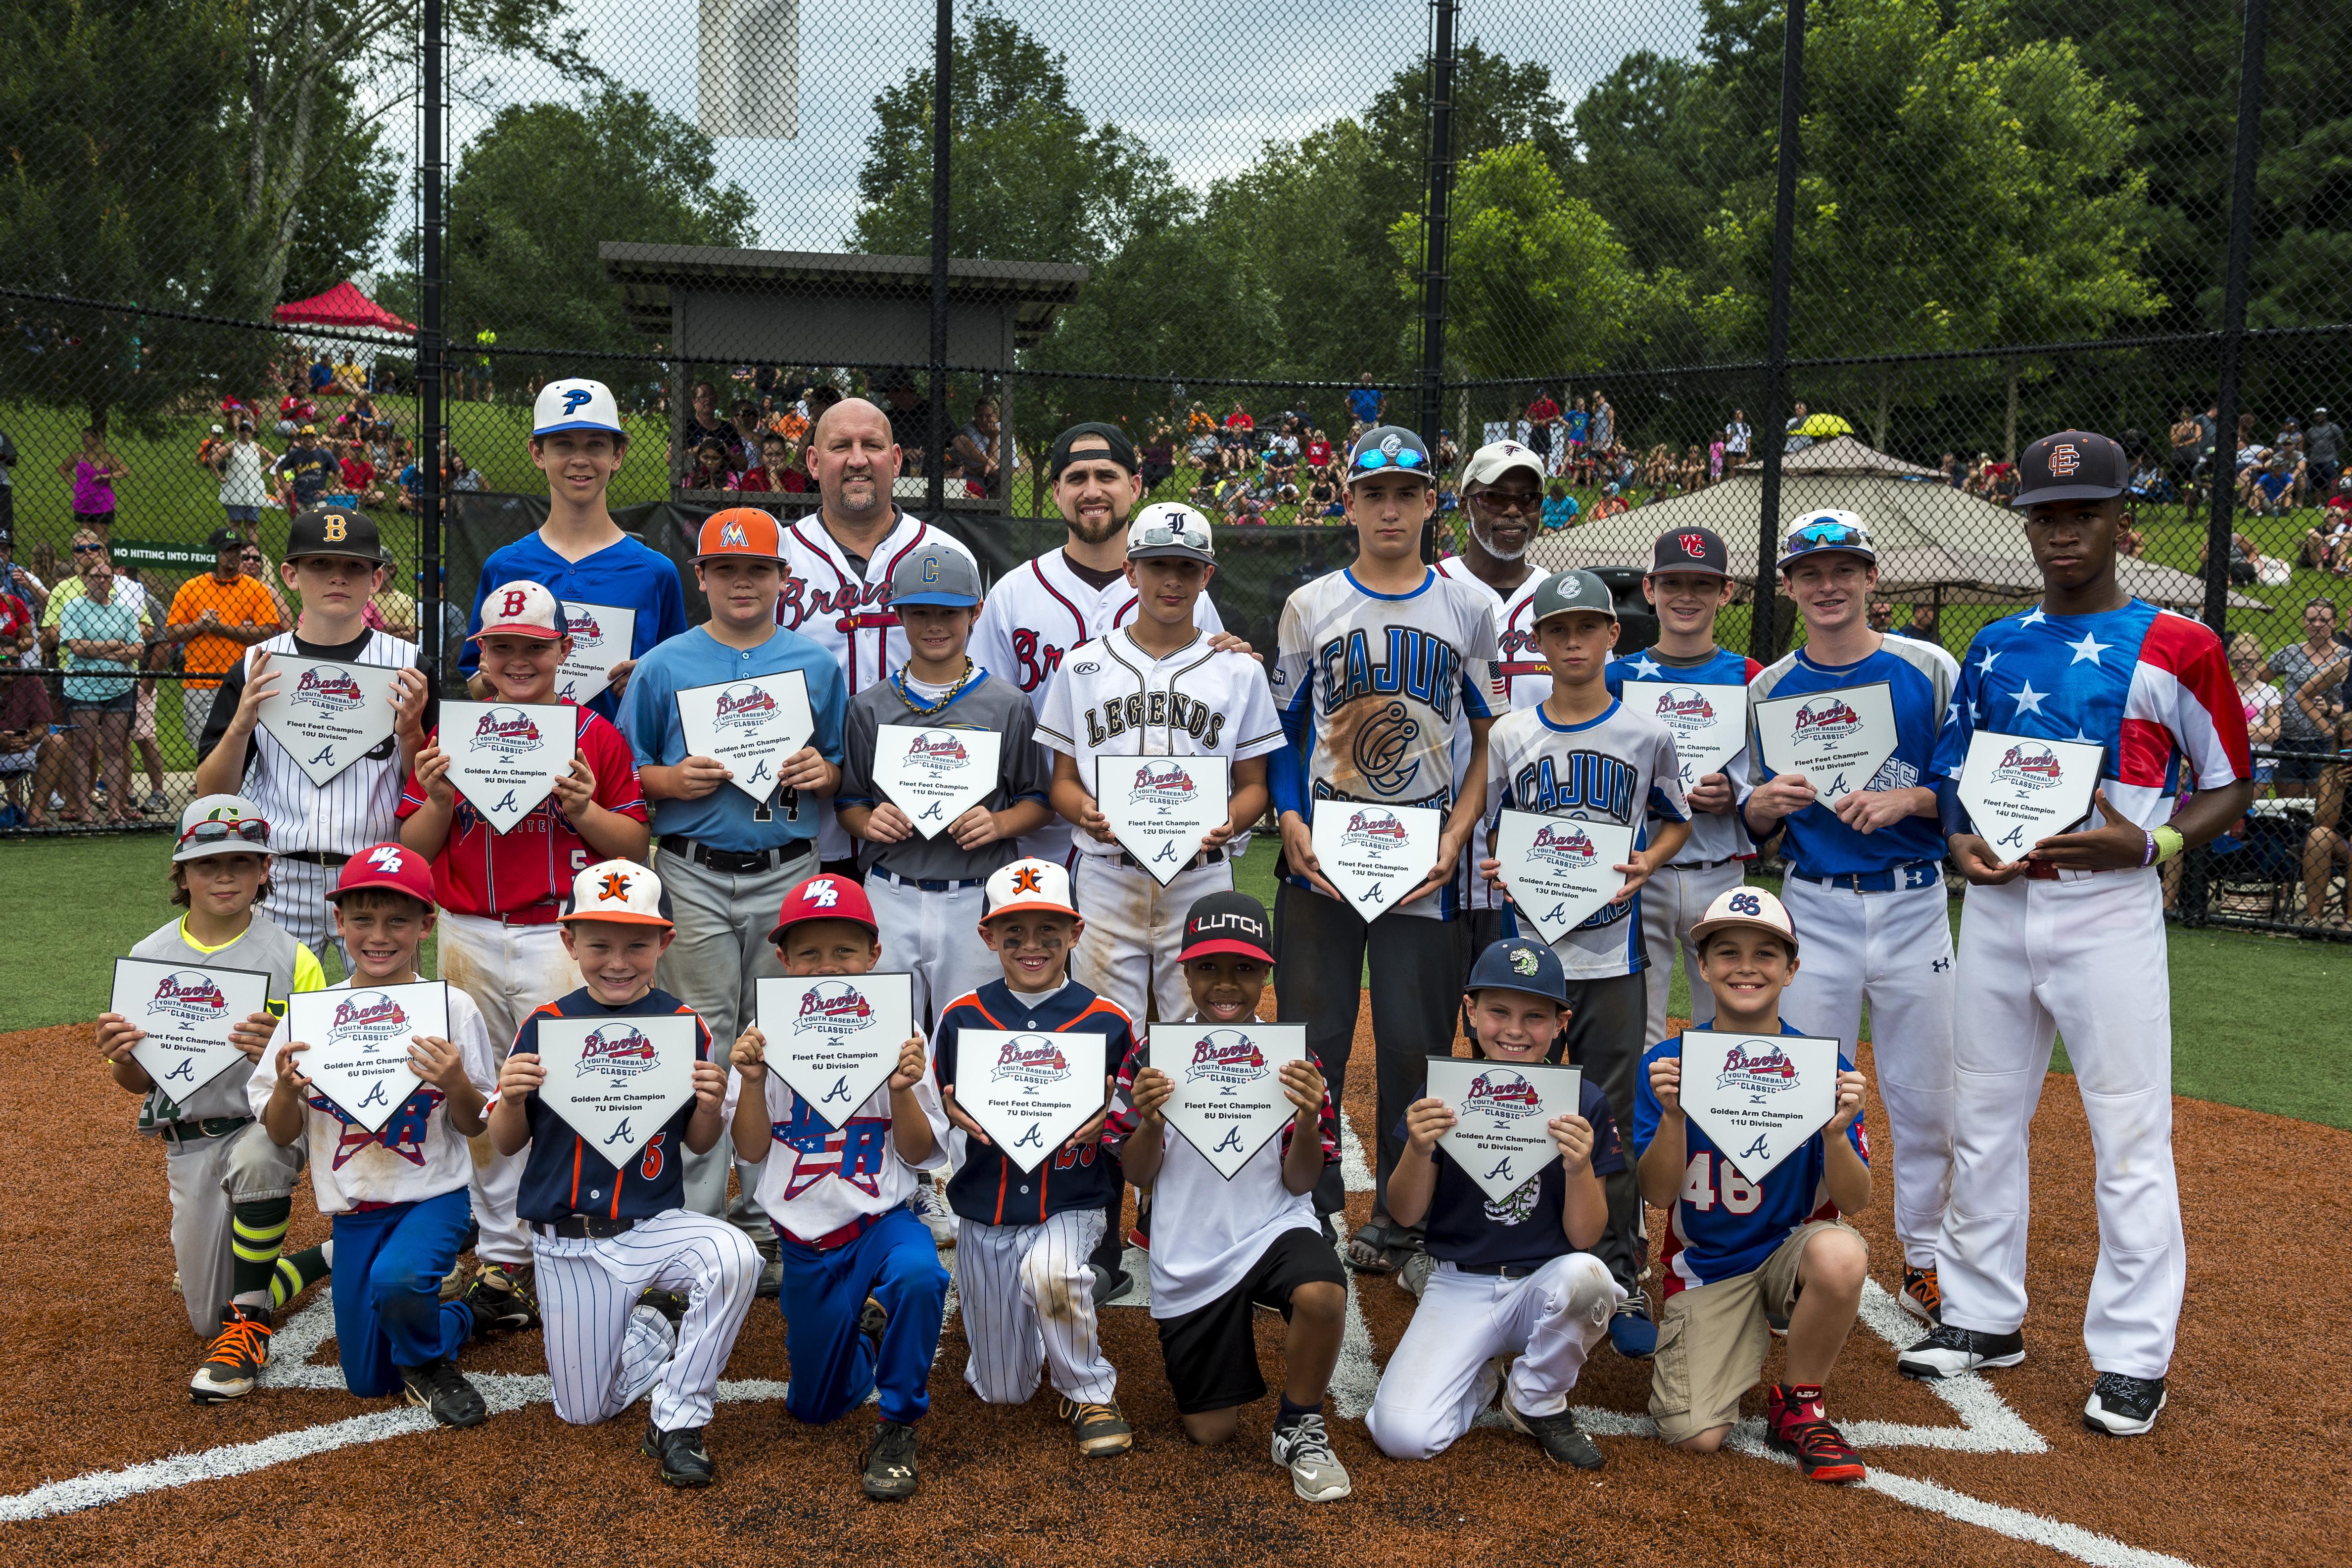 timeless design a331c 74e9a Atlanta Braves Youth Baseball Classic 2018